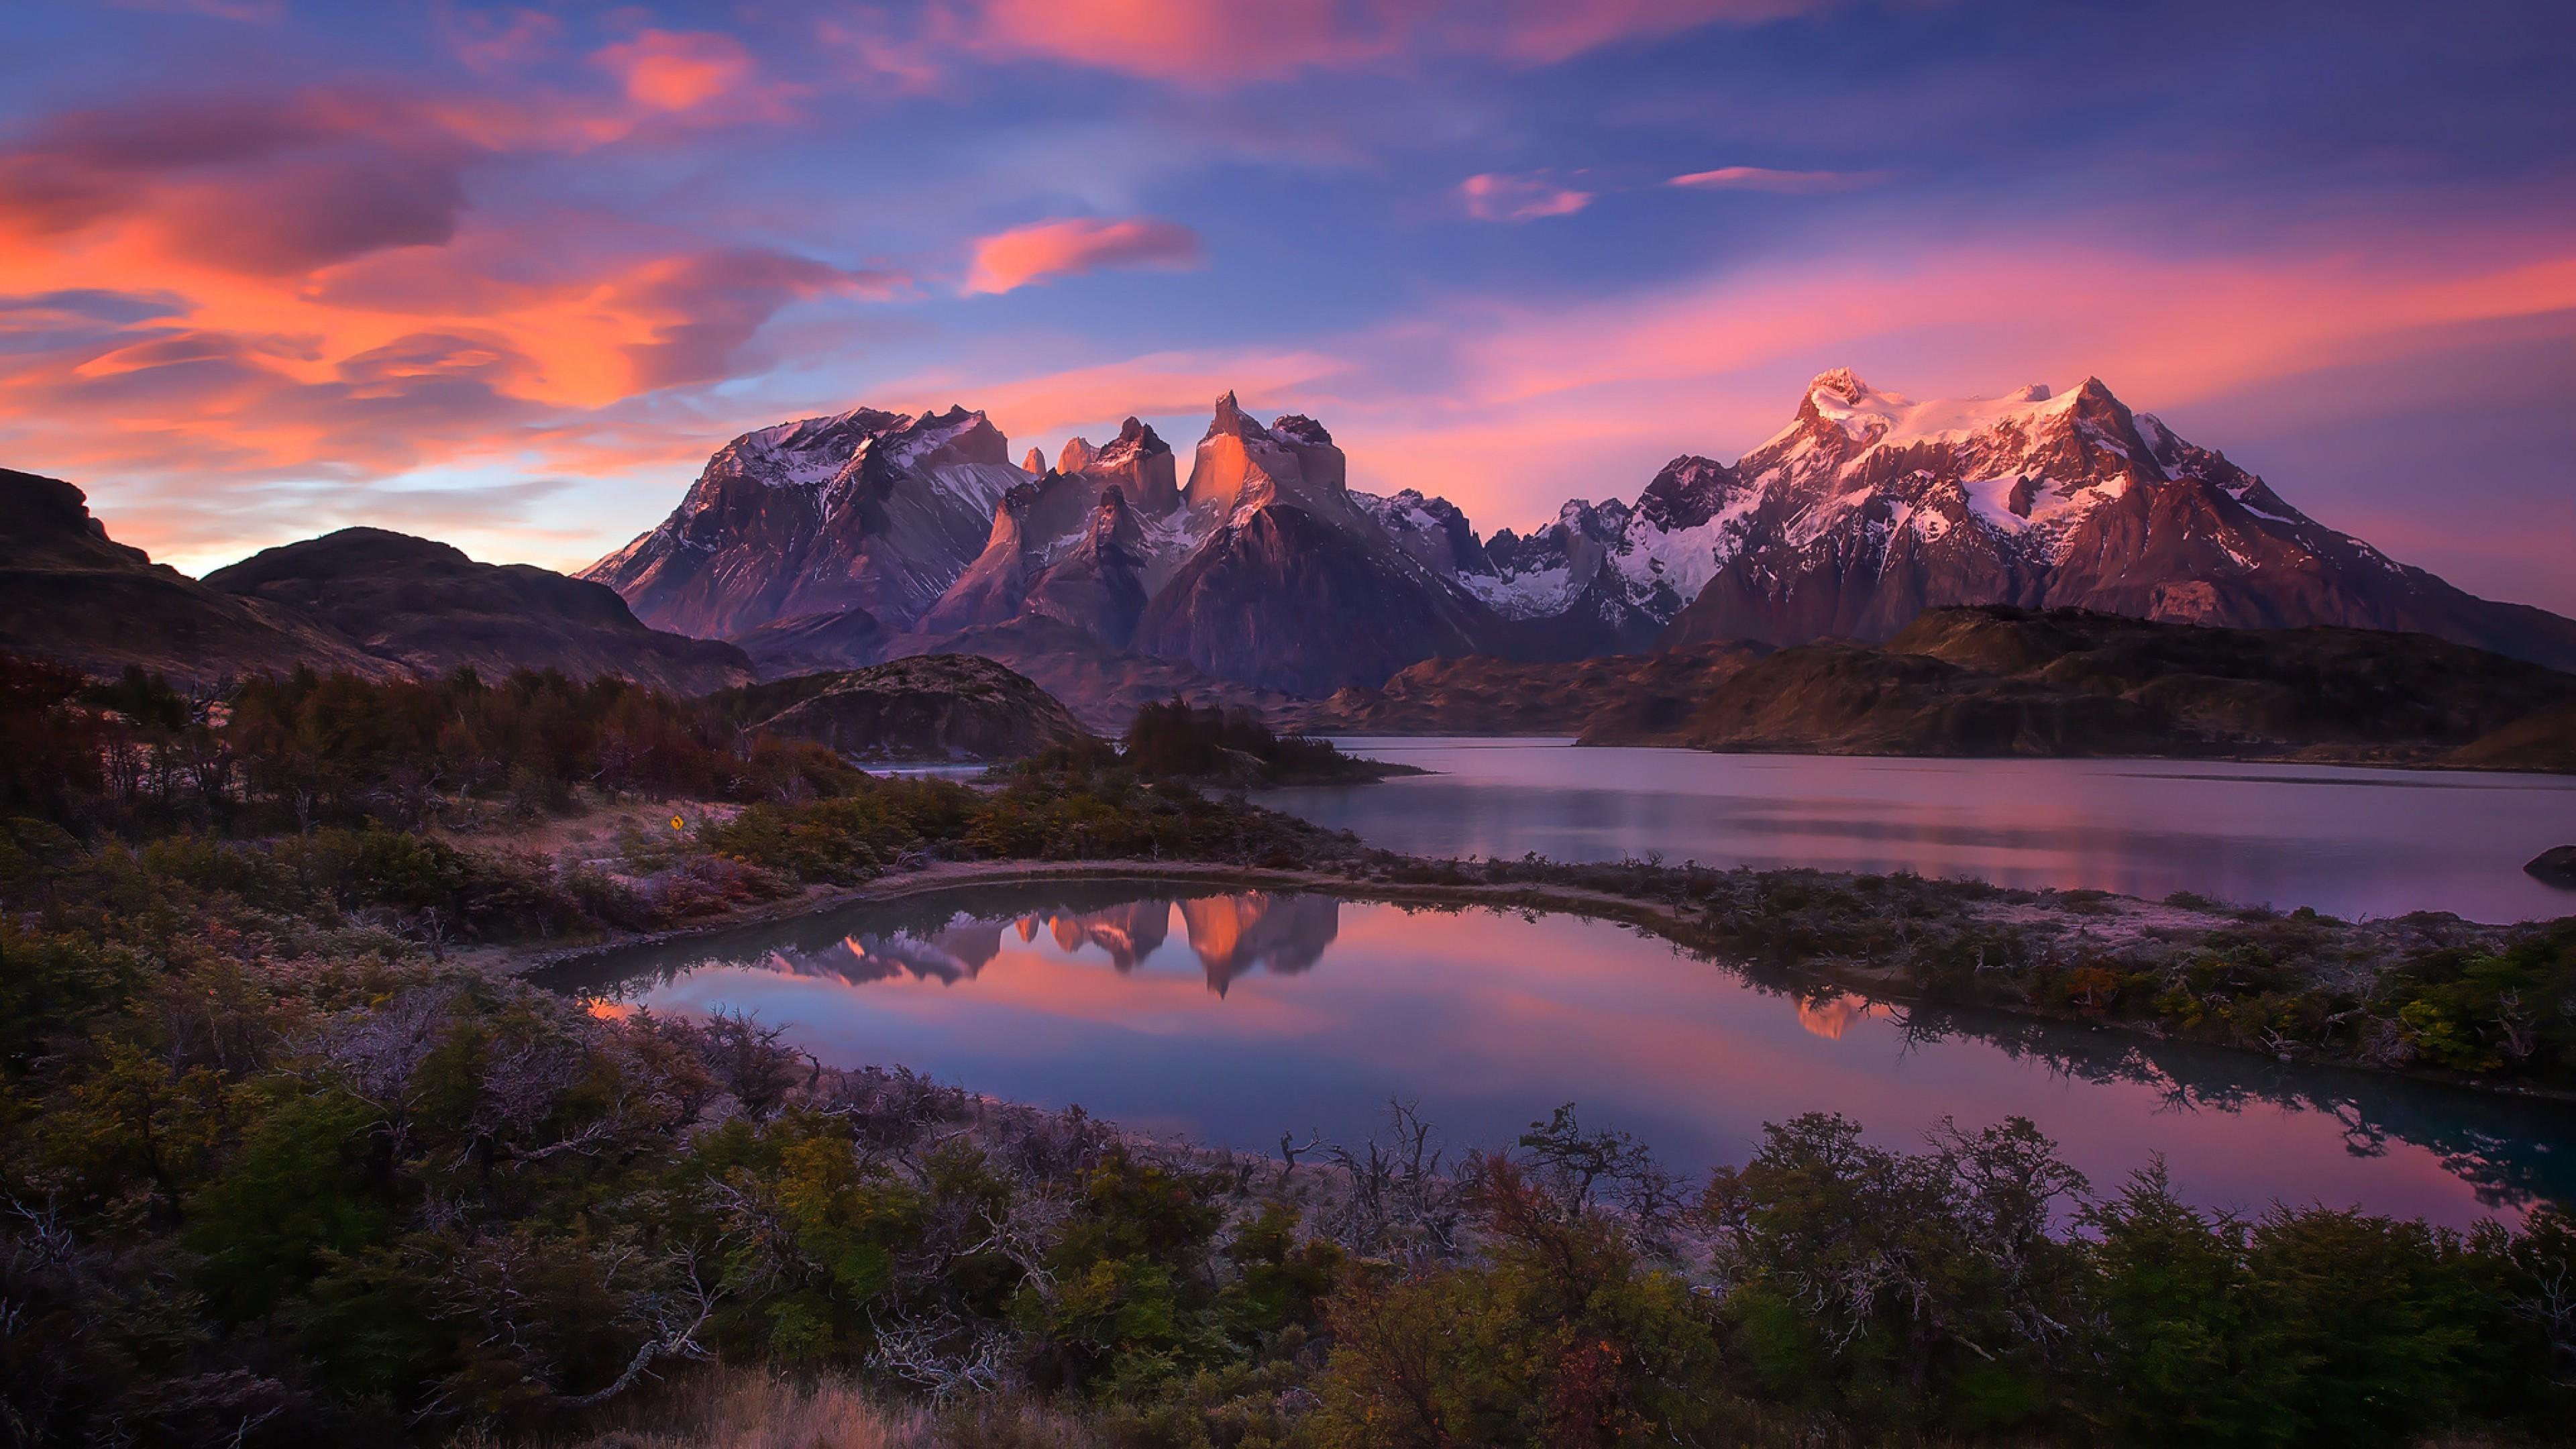 south america patagonia andes mountains lake 1535930205 - South America Patagonia Andes Mountains Lake - world wallpapers, nature wallpapers, mountains wallpapers, lake wallpapers